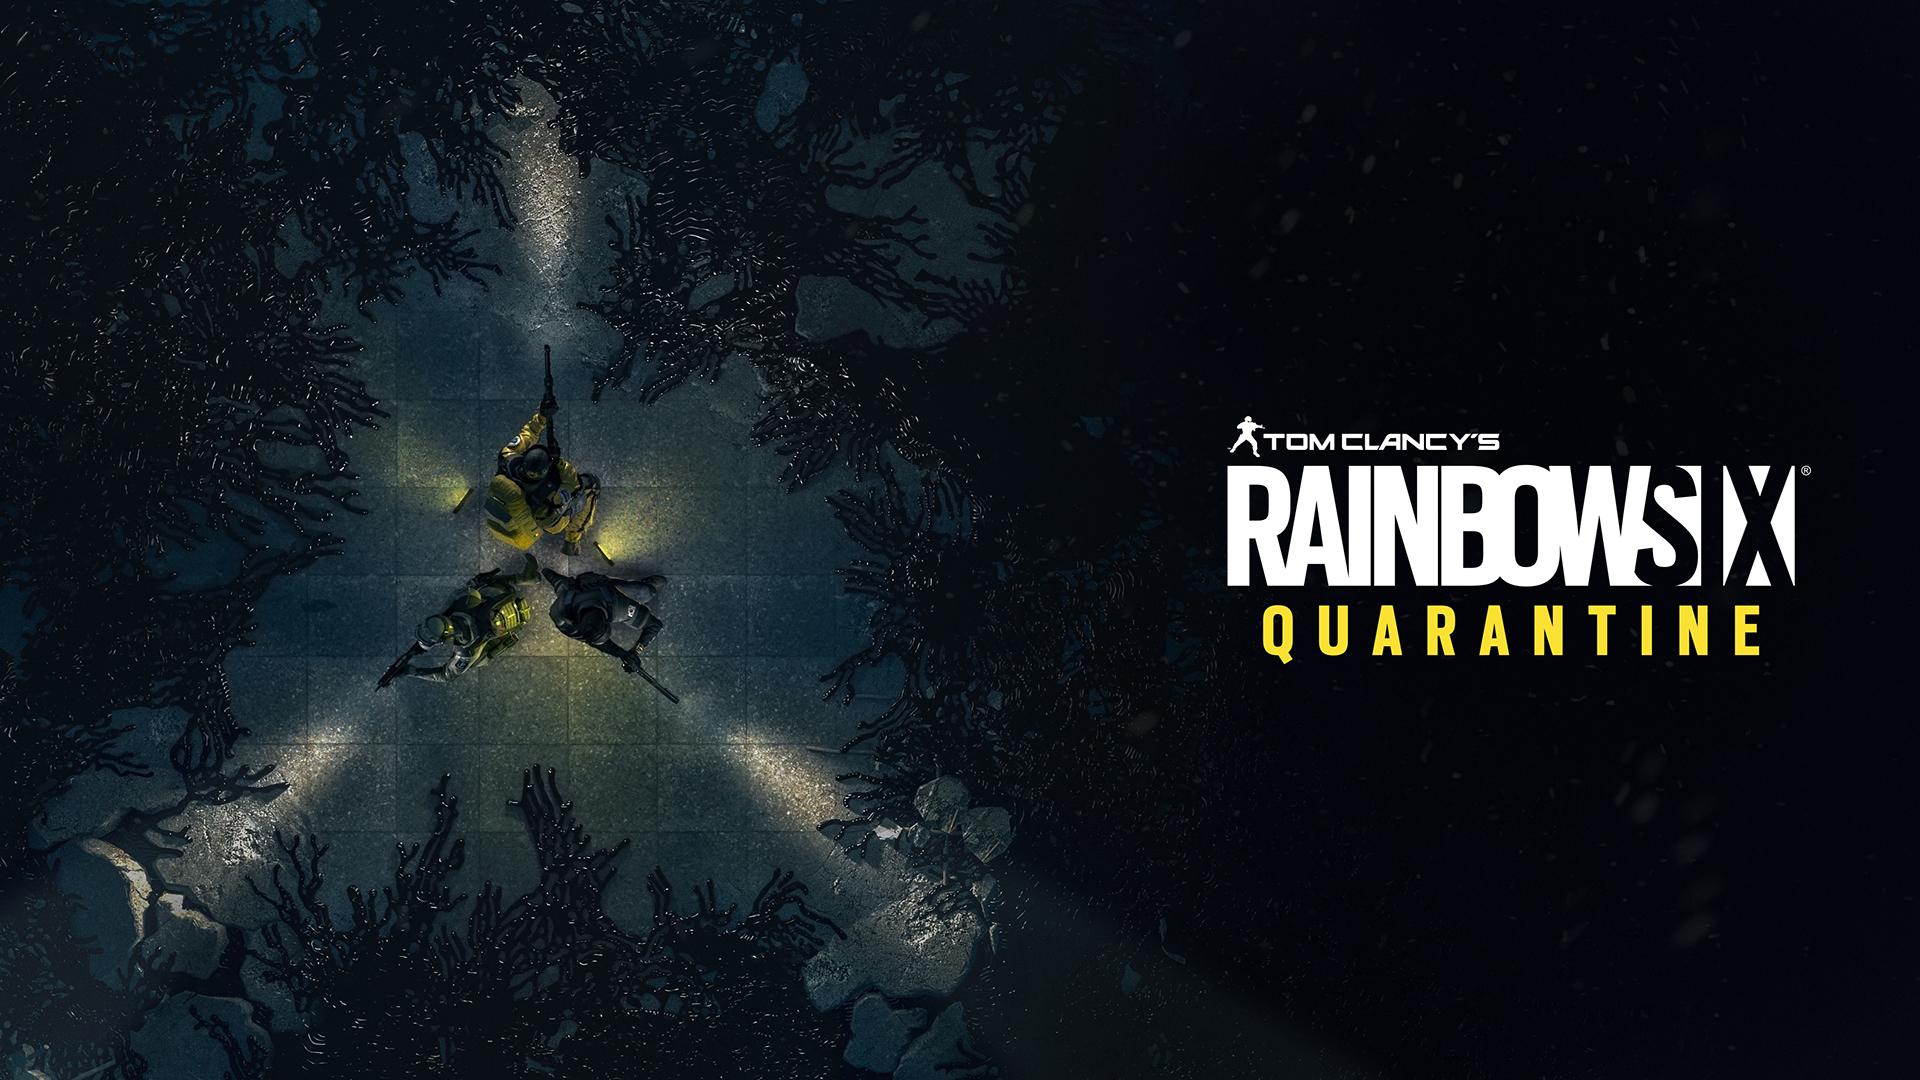 Rainbow Six Quarantine: Release date, gameplay, trailers